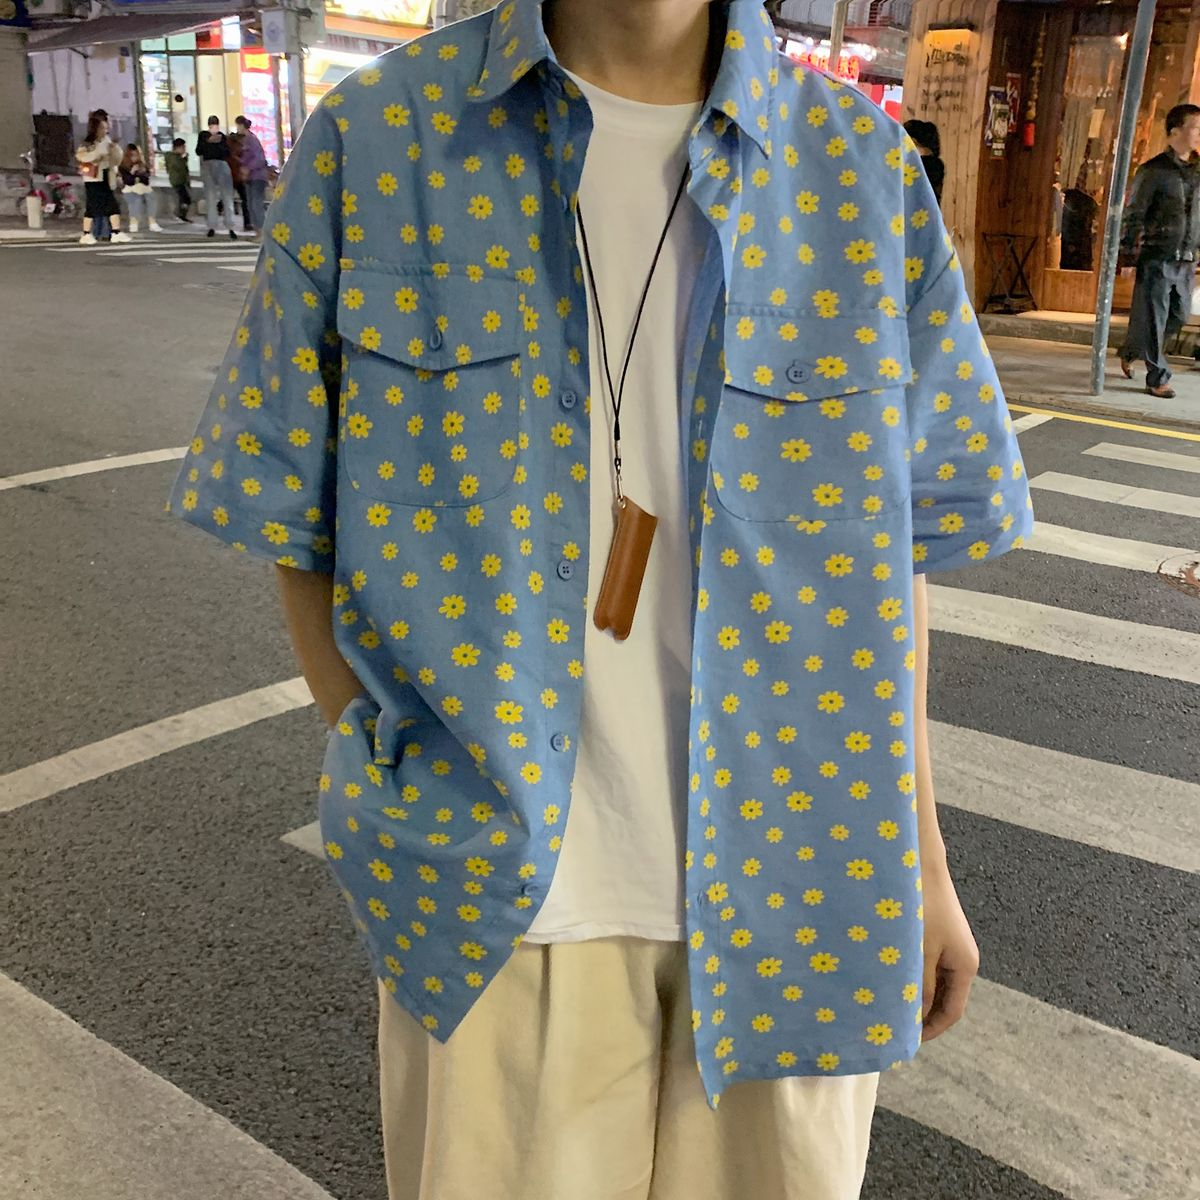 2020 Men's Short Sleeve Hawaiian Shirt Flower Printing Wash Denim Shirt French Cuff Mens Fashion Shirts Camisa Masculina M-2XL